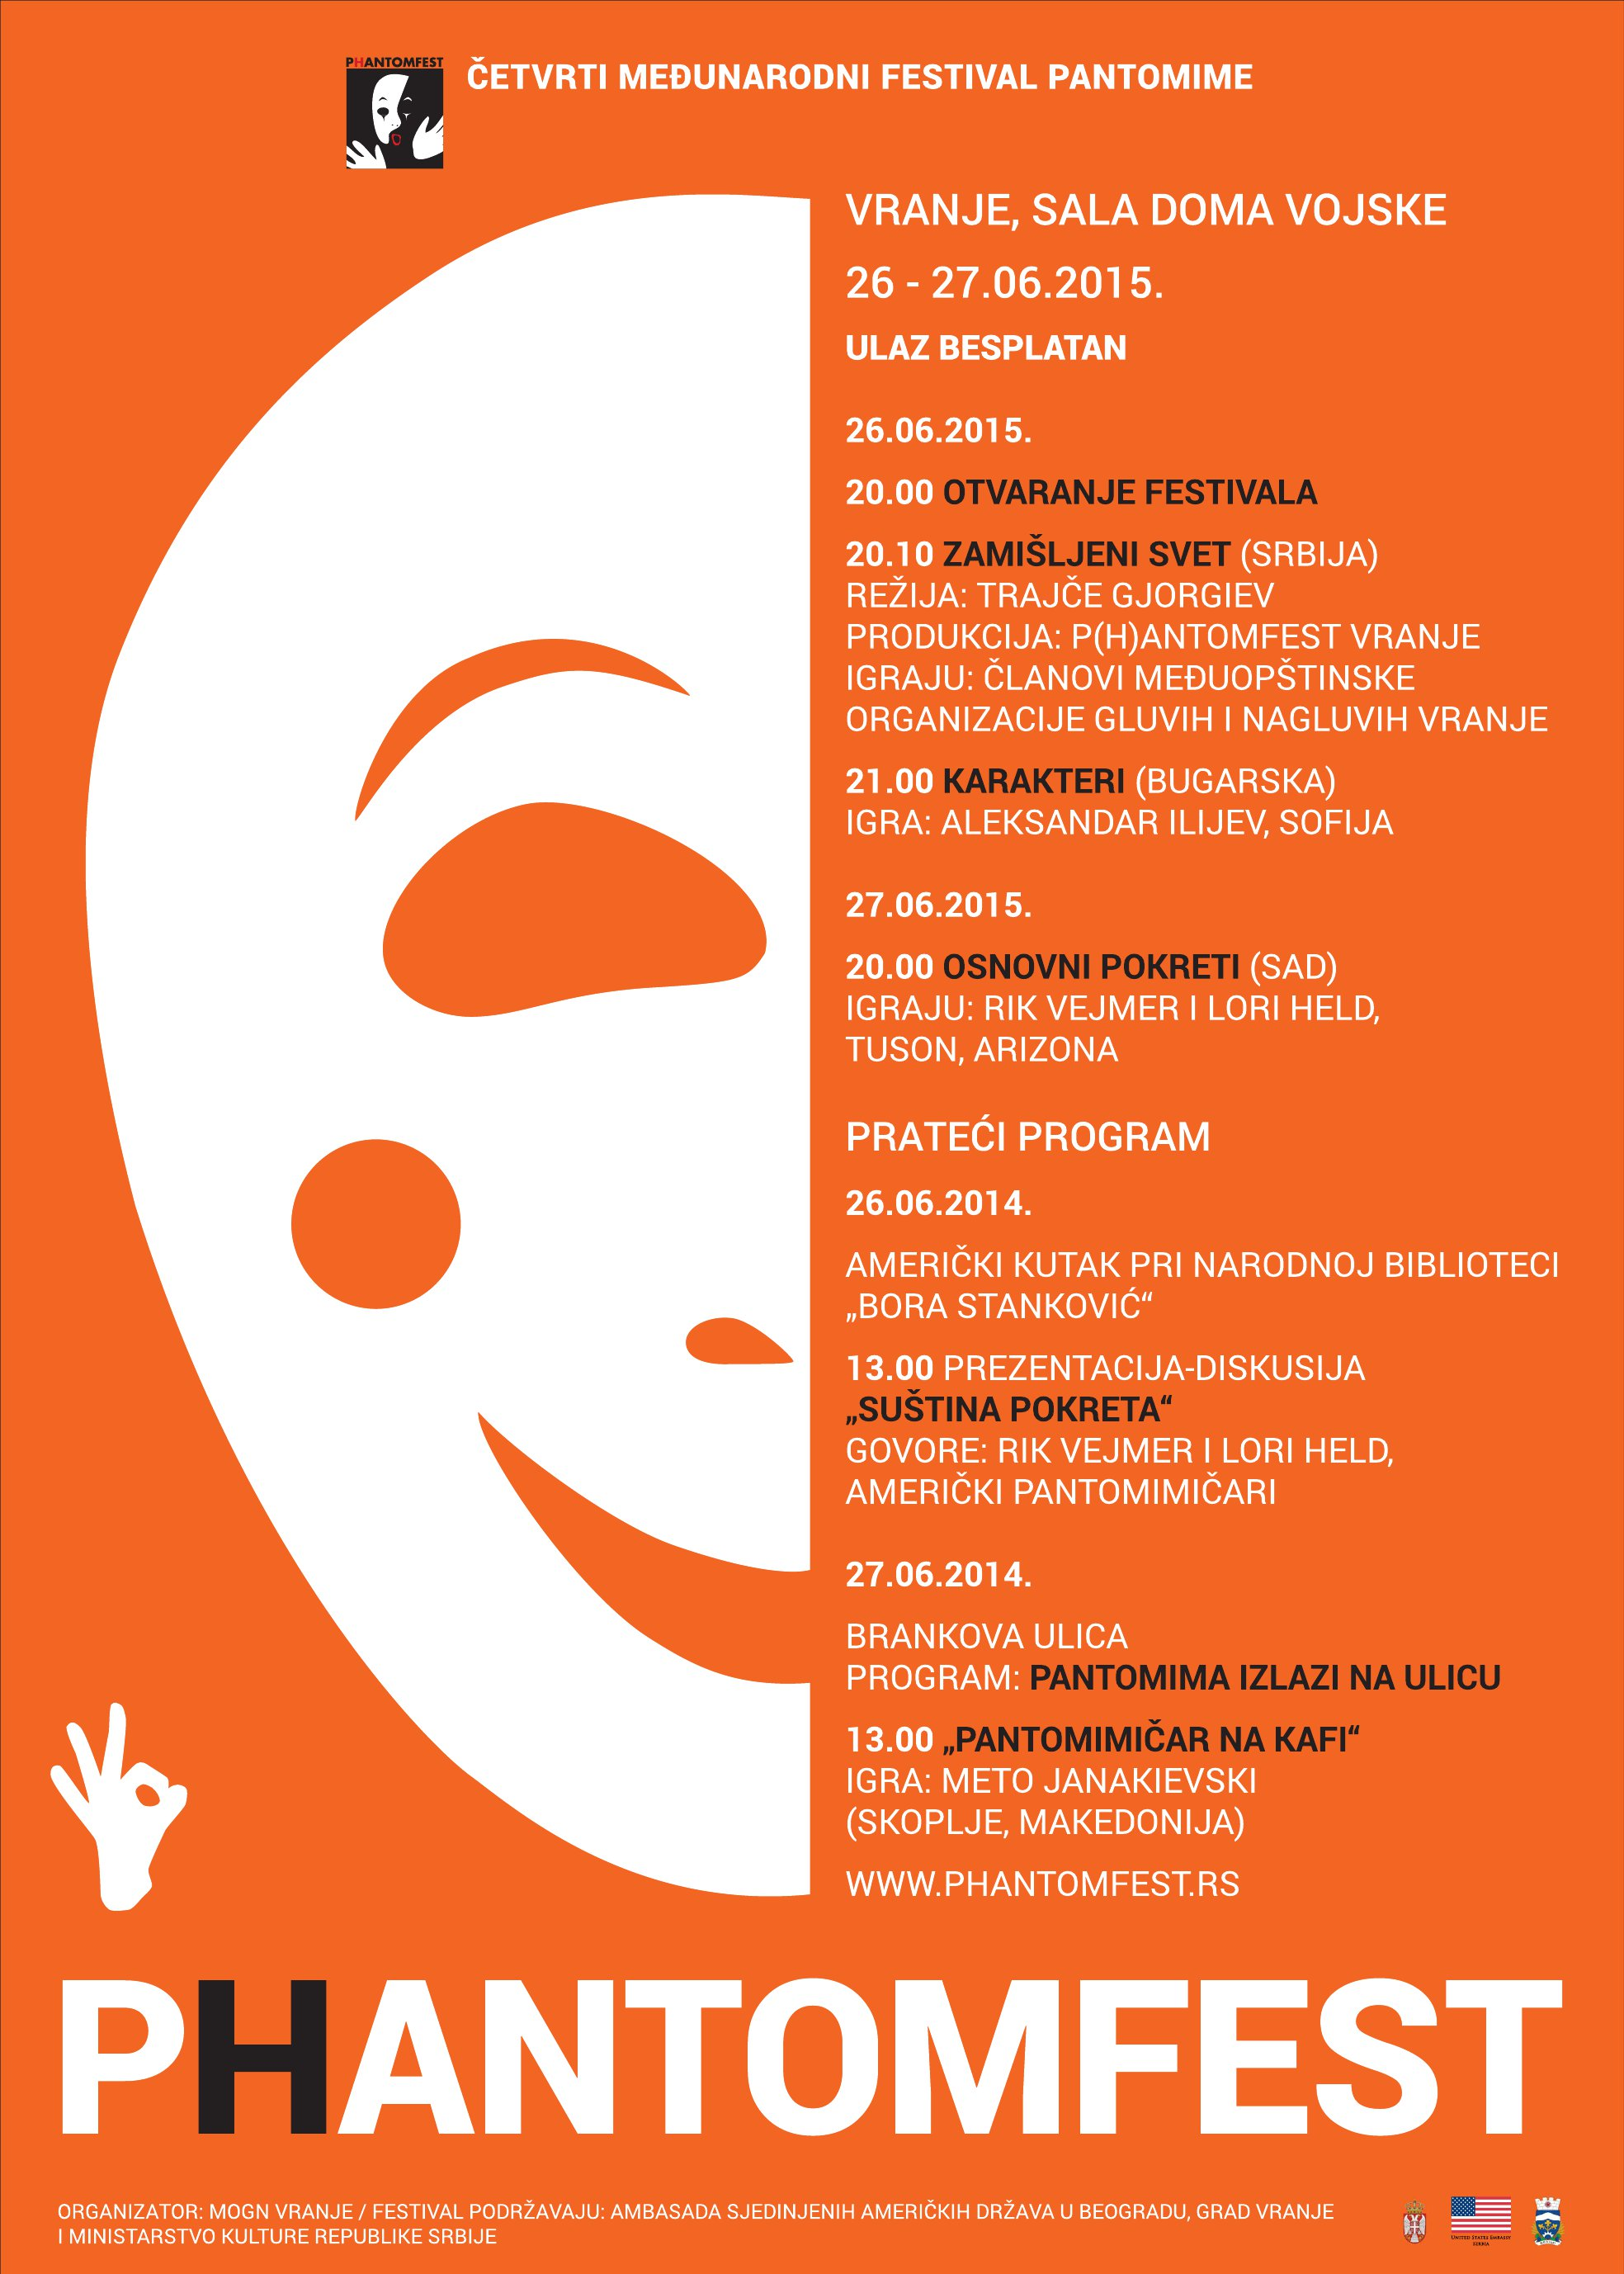 Plakat Phantomfest 2105